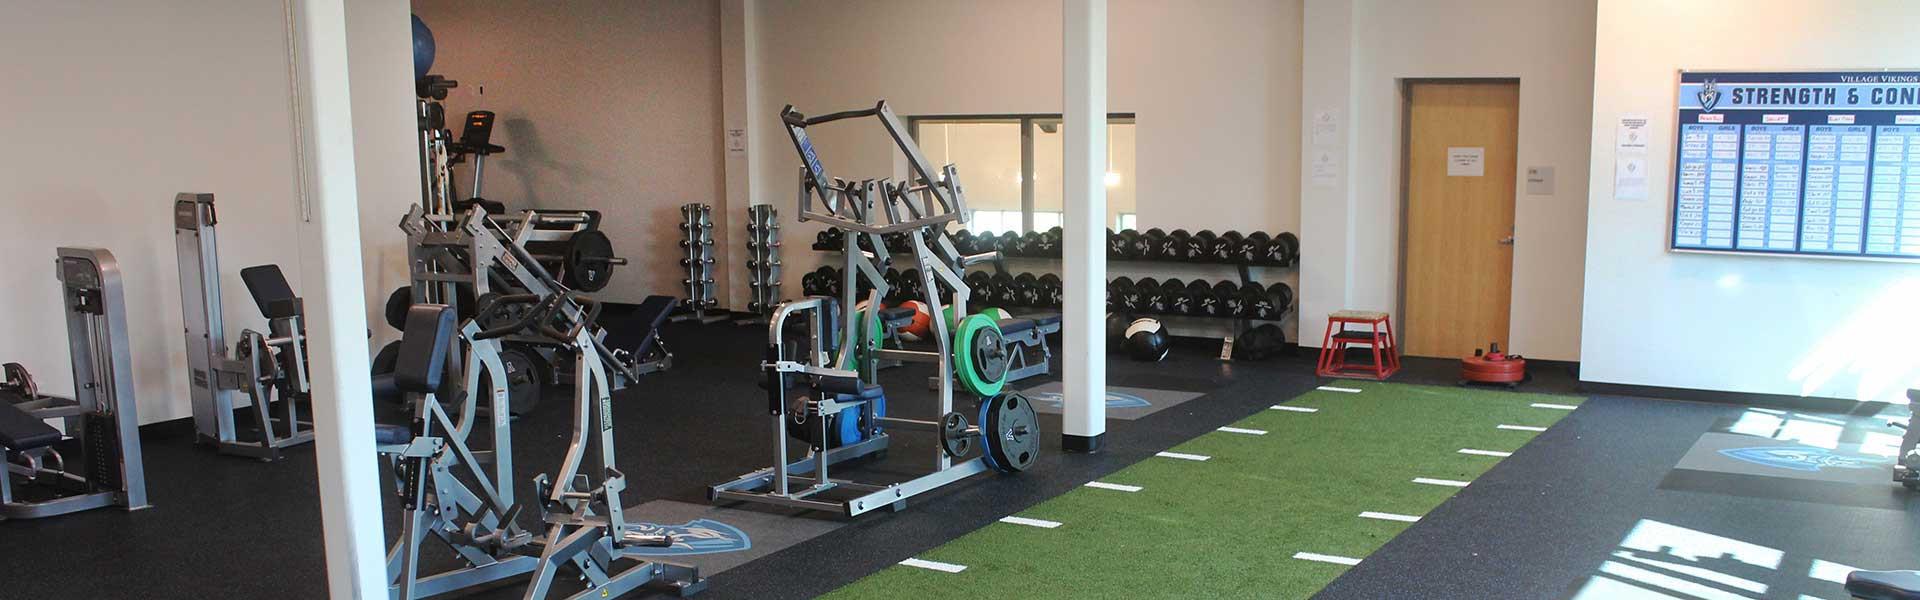 The Village School Texas USA weight room